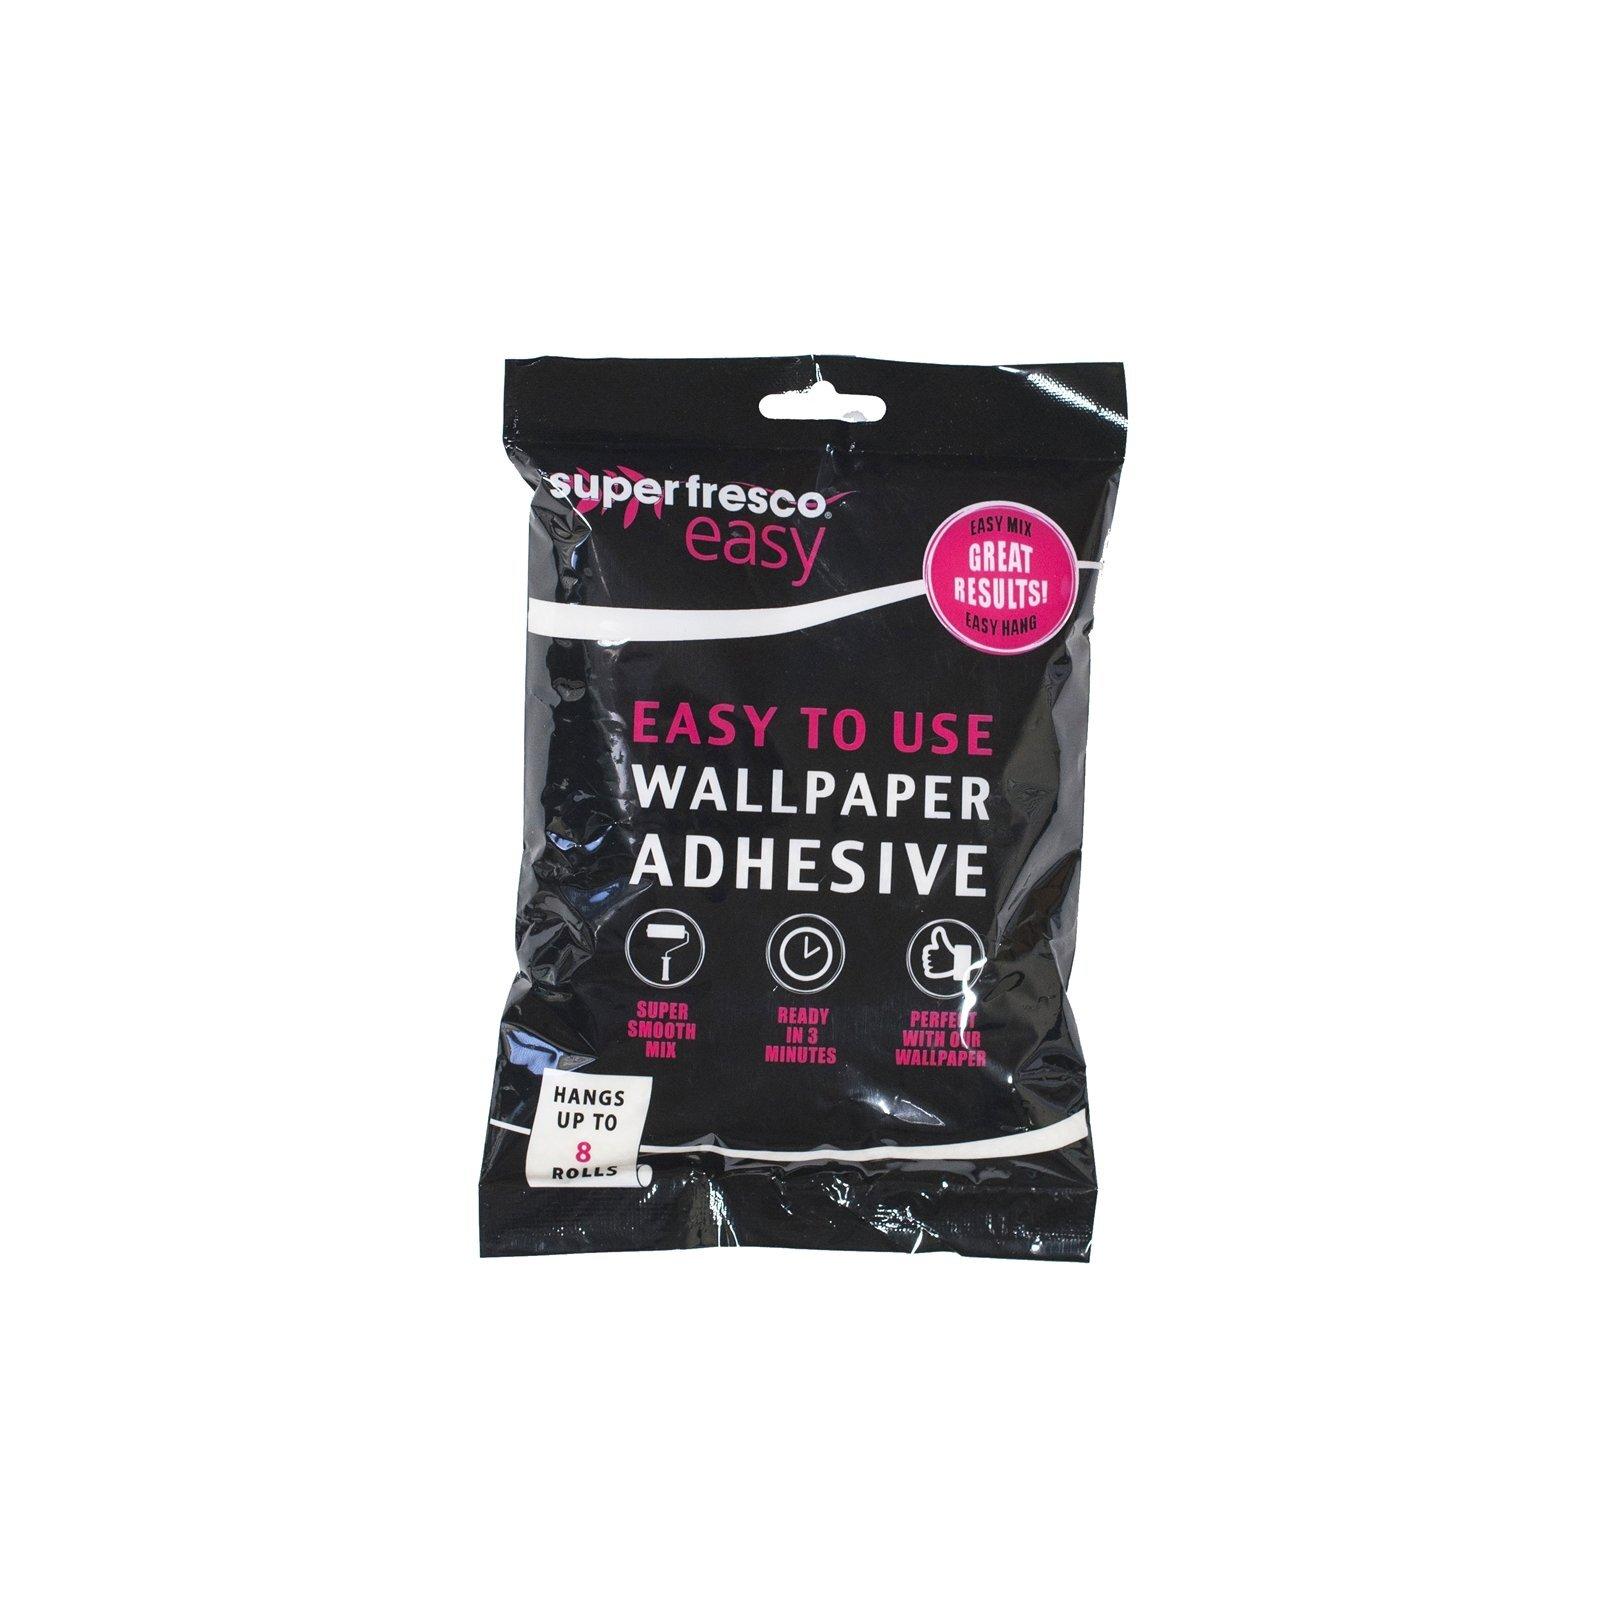 Superfresco Easy Wallpaper Adhesive